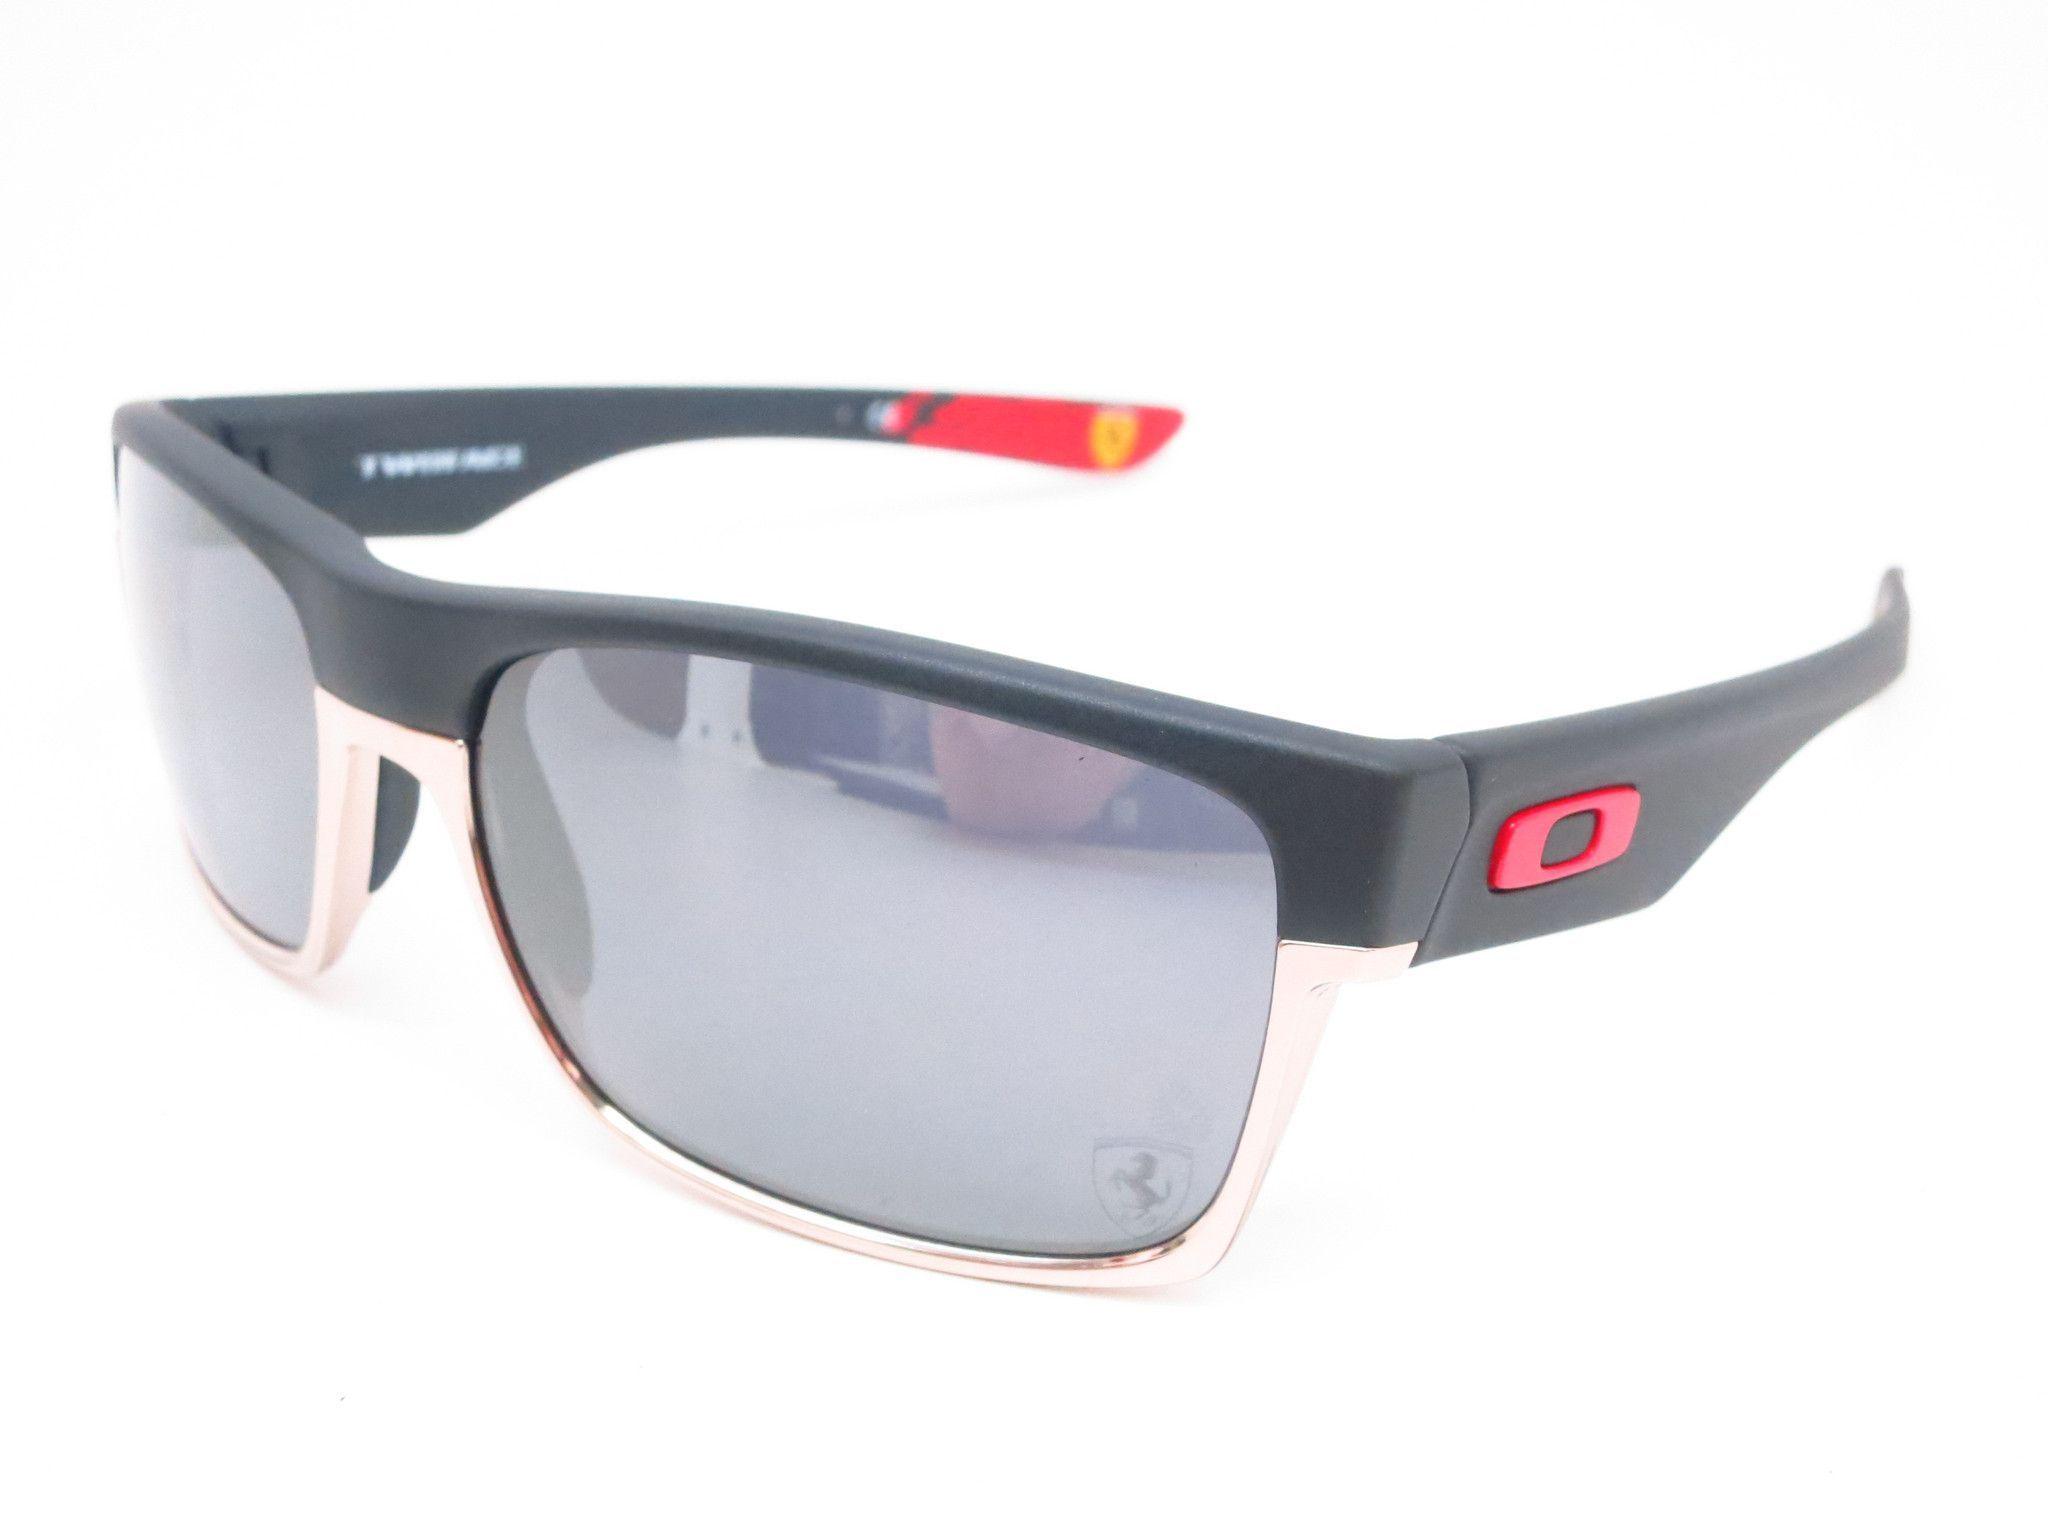 61c15da5bf Oakley Twoface OO9189-20 Matte Black Scuderia Ferrari Sunglasses ...